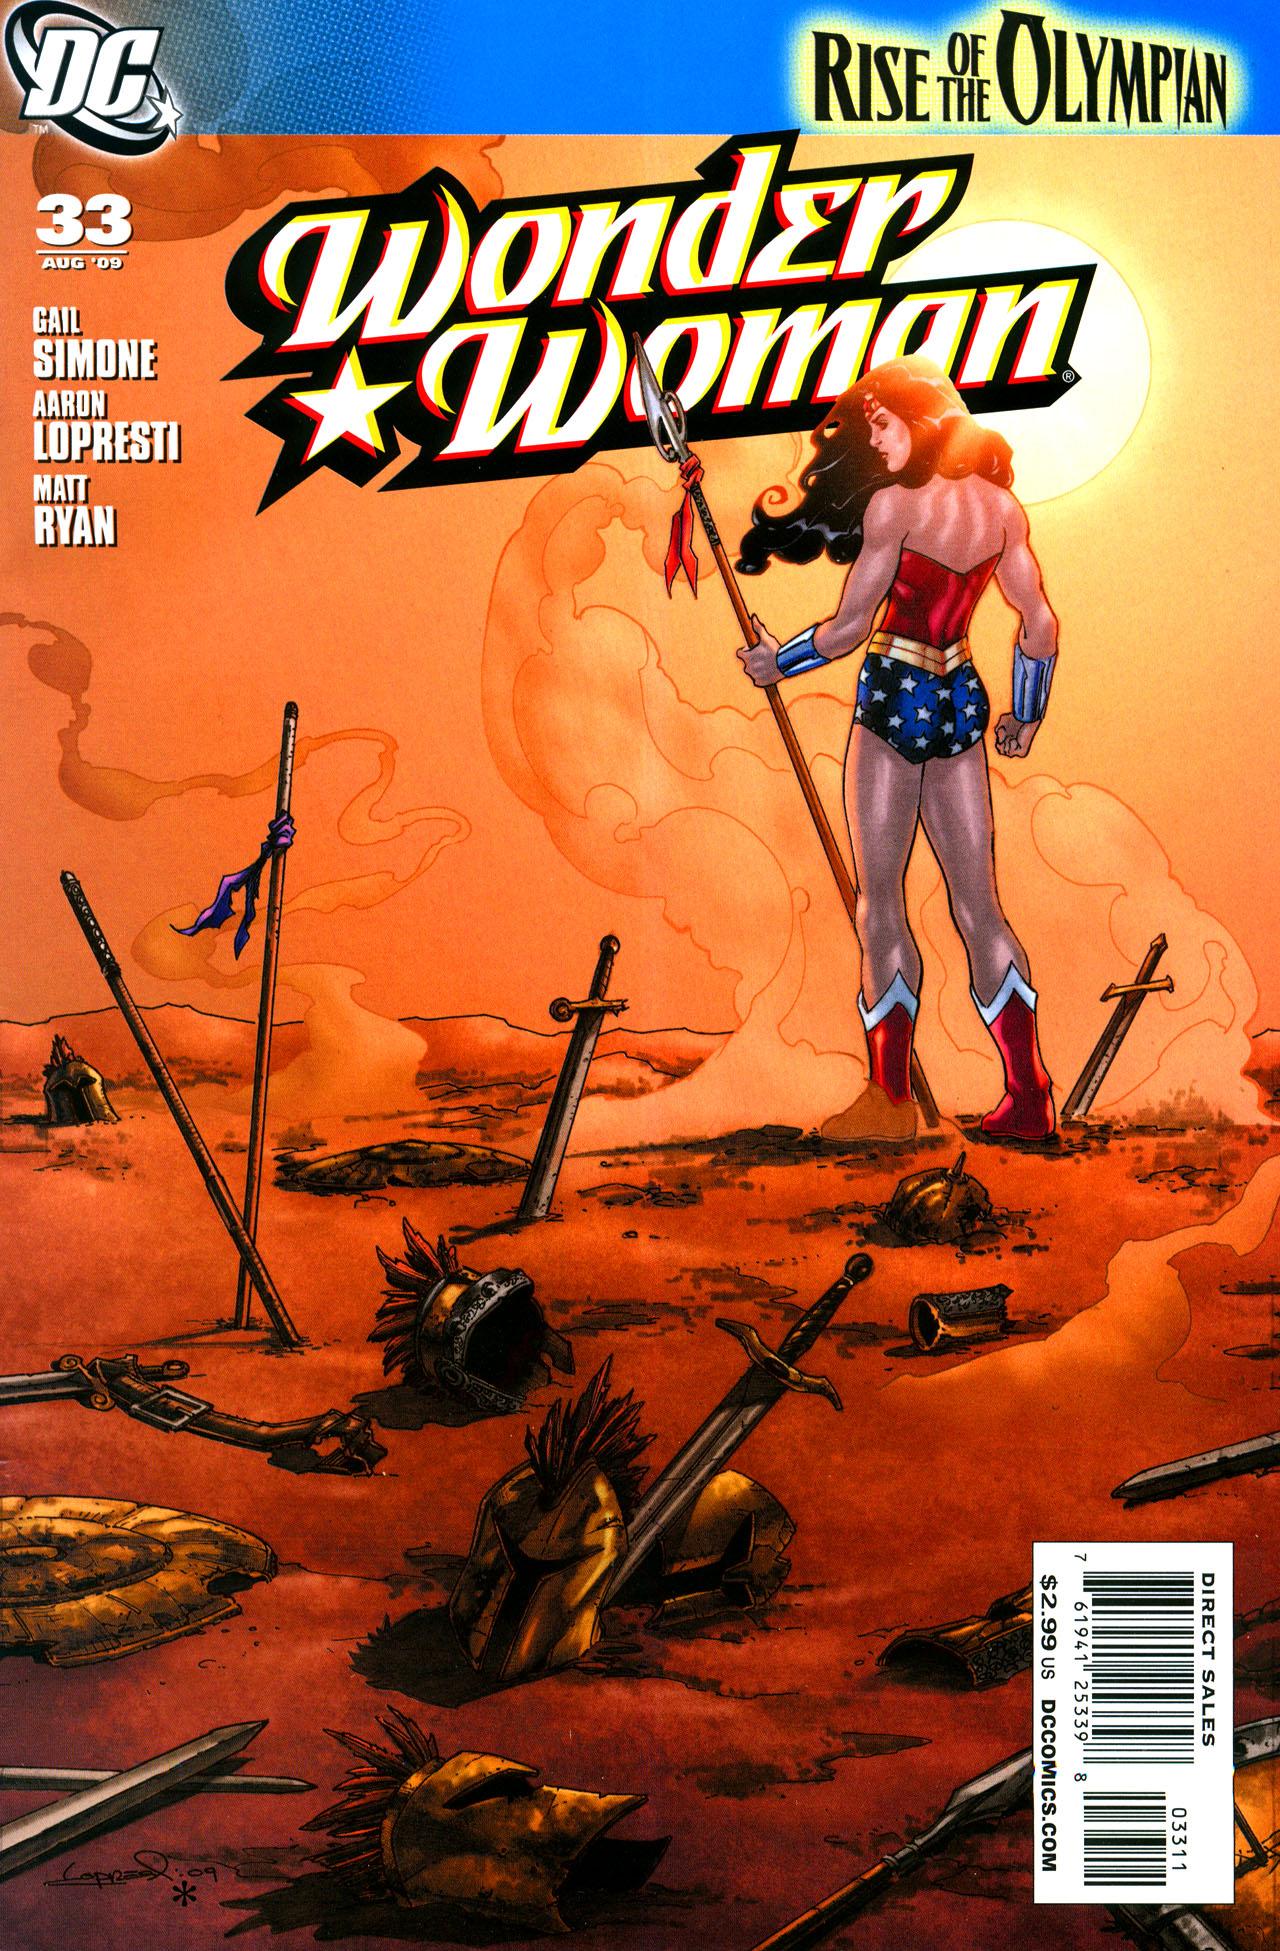 Read online Wonder Woman (2006) comic -  Issue #33 - 1